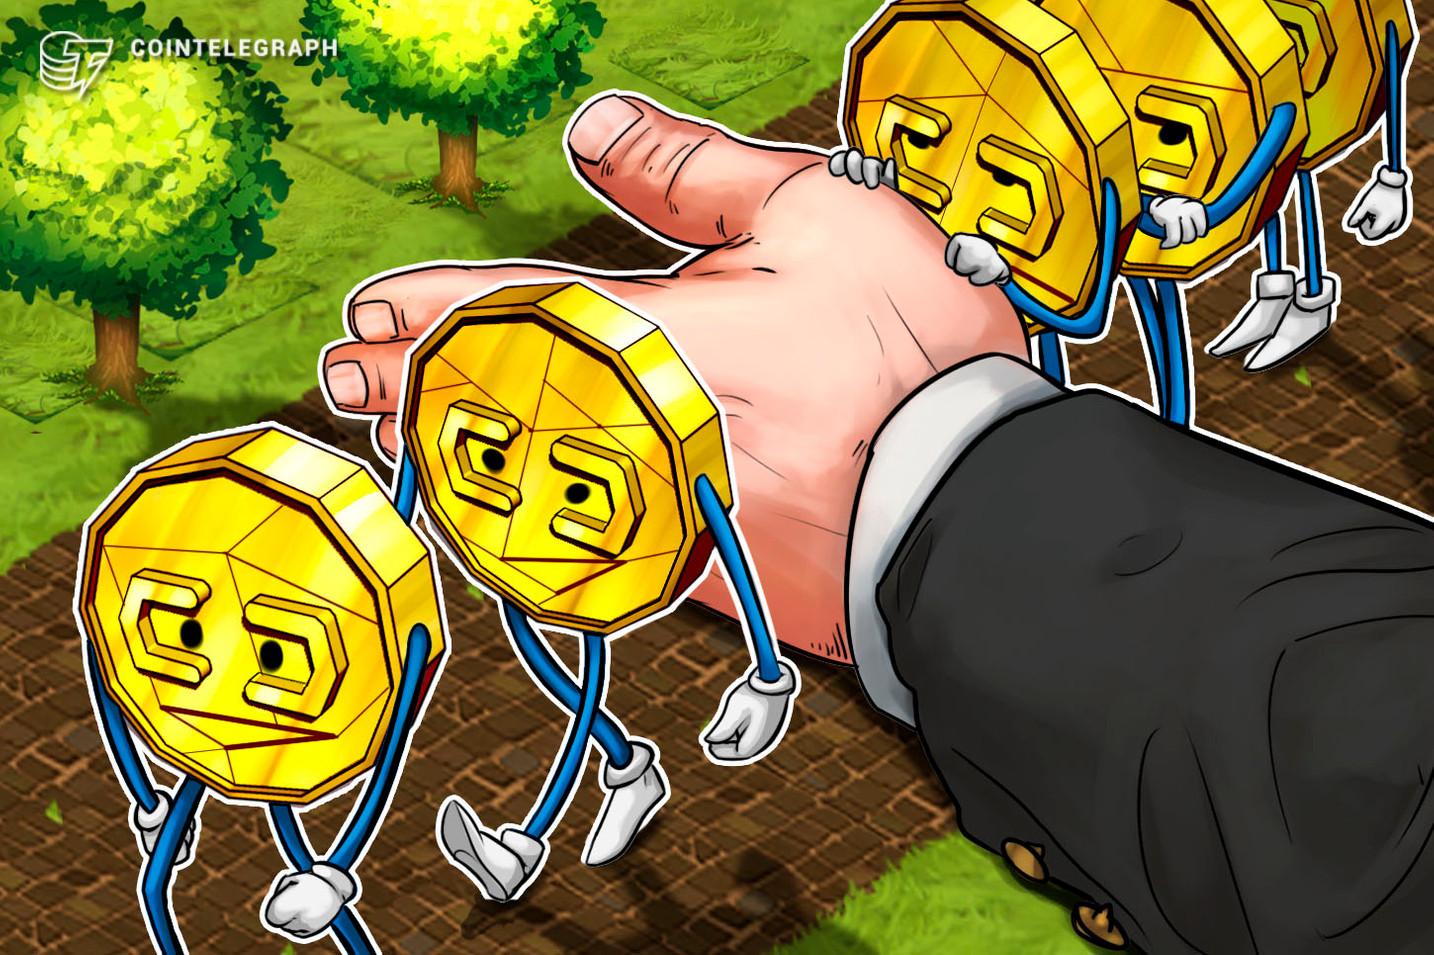 Binance stops stock token sales, 'effective immediately'